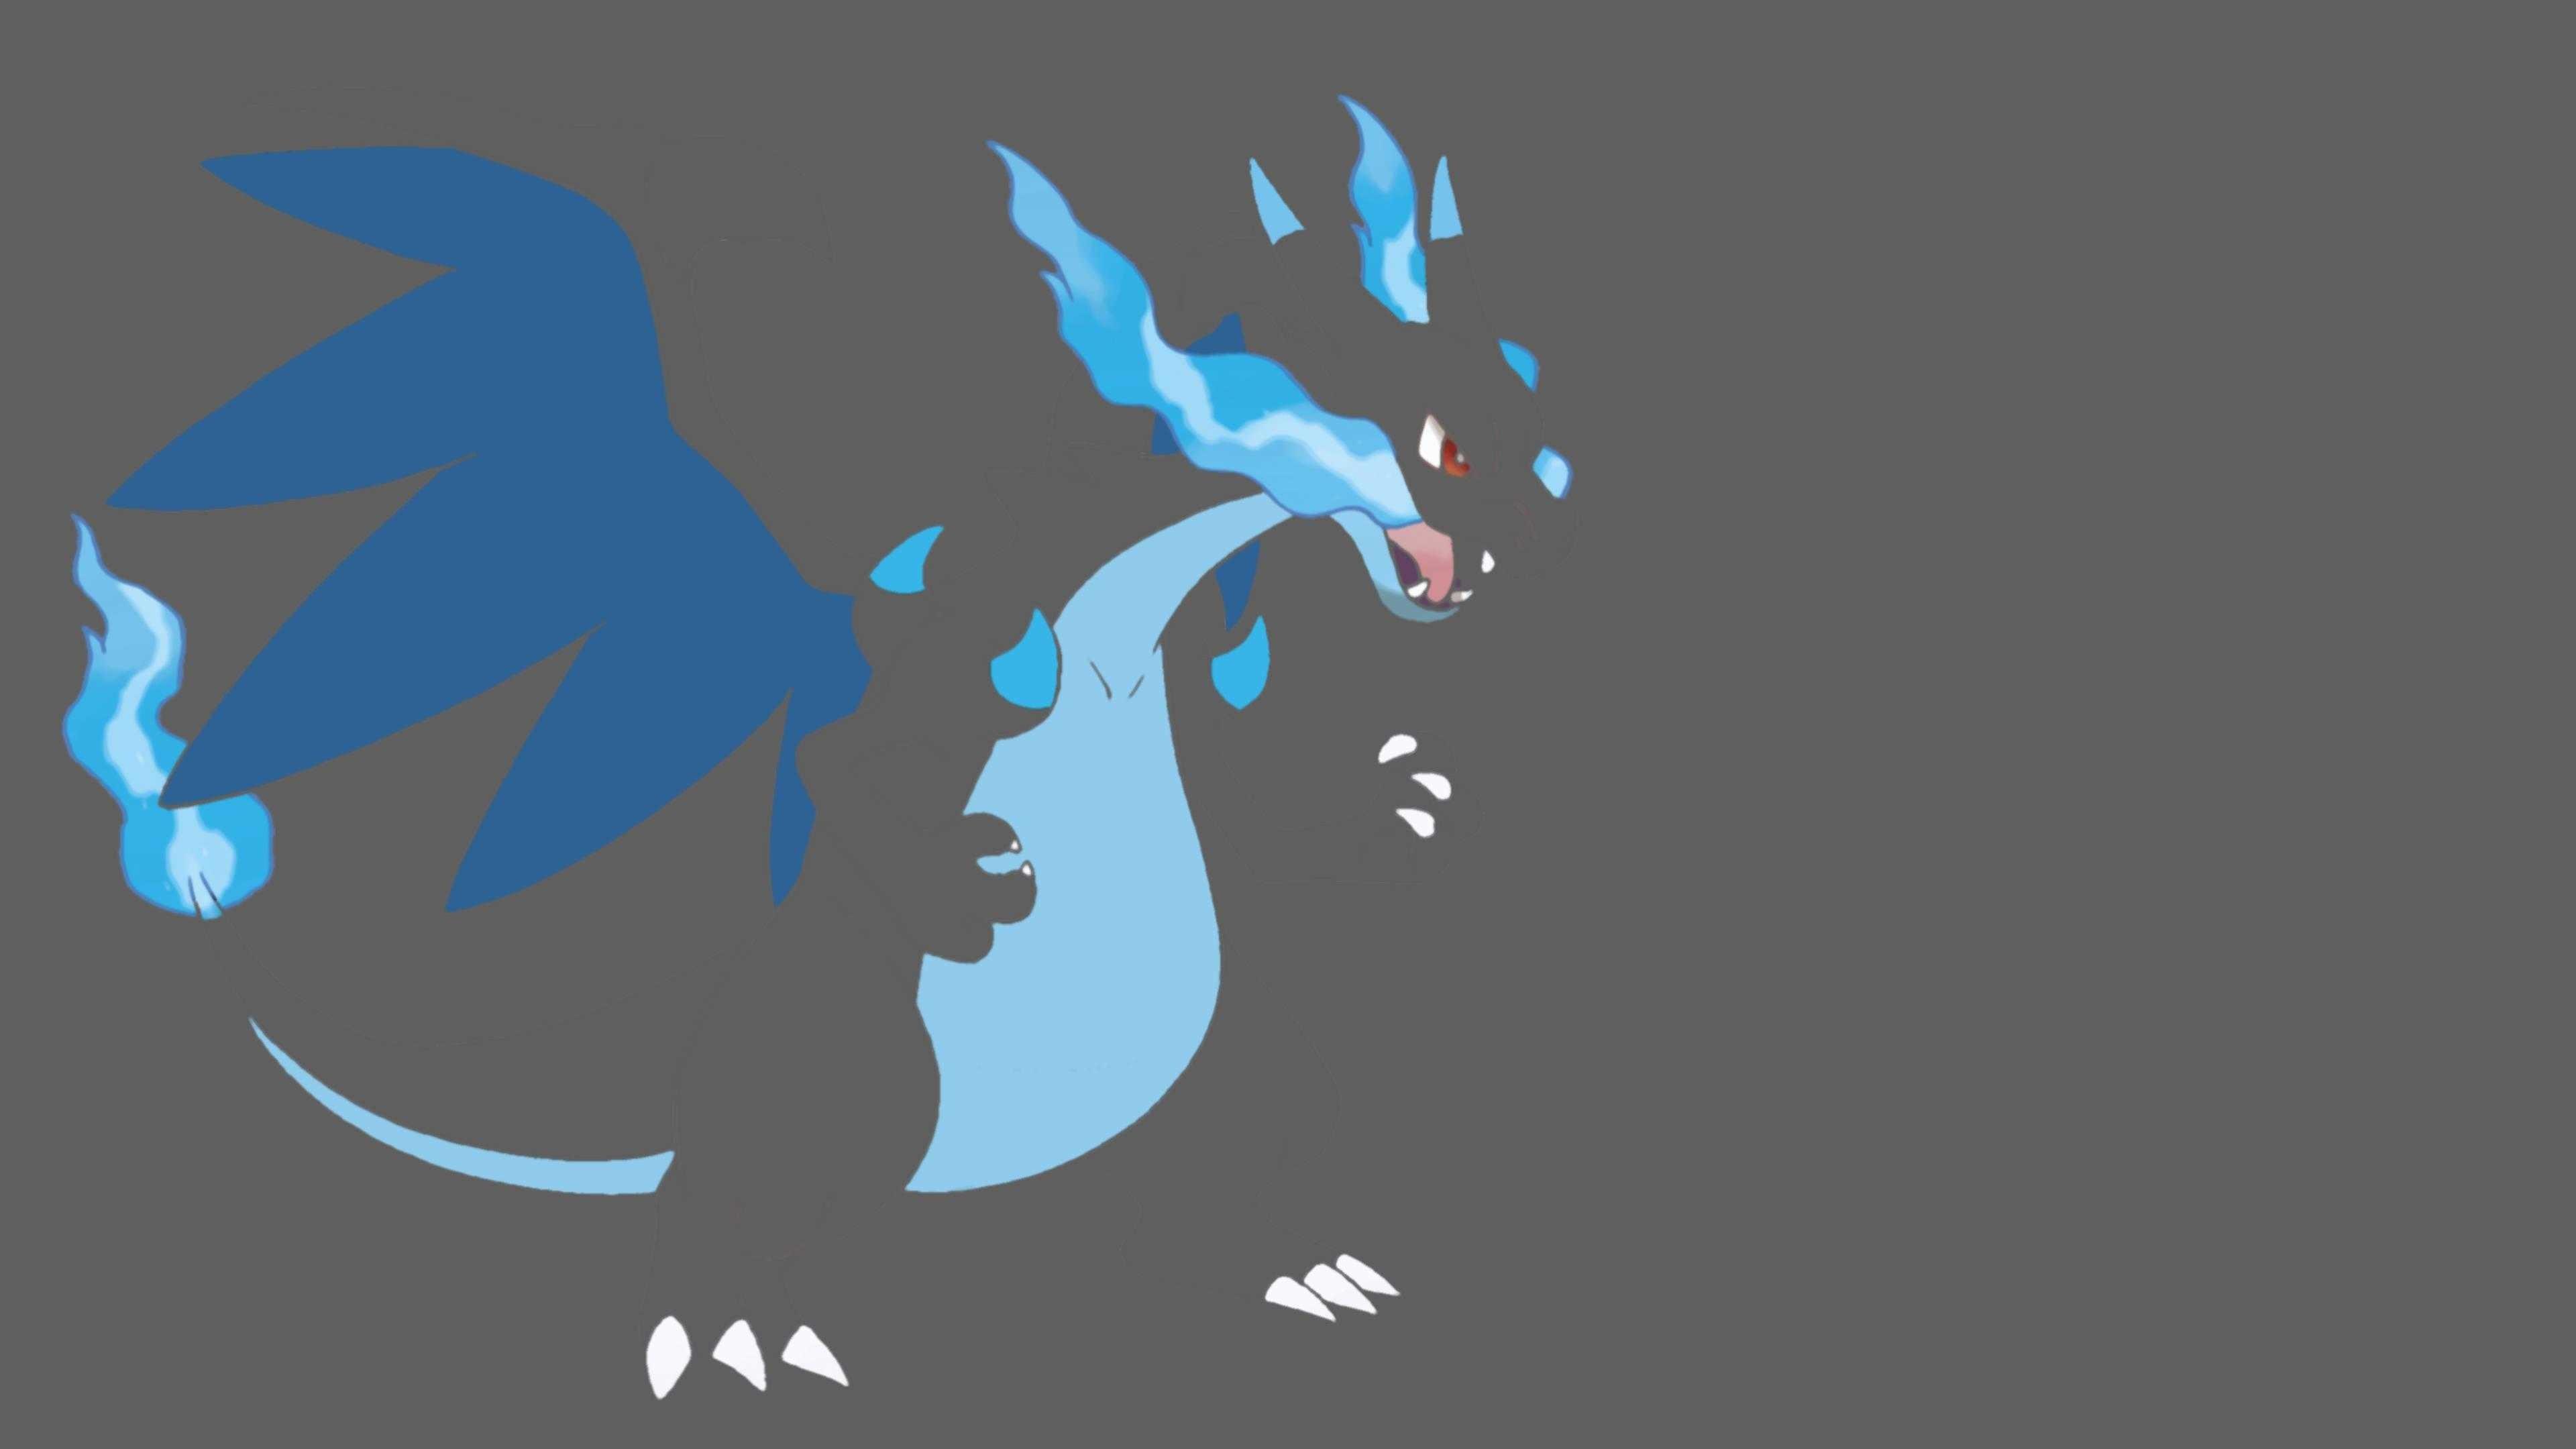 pokemon wallpaper – Tag | Download HD Wallpaperhd wallpapers .